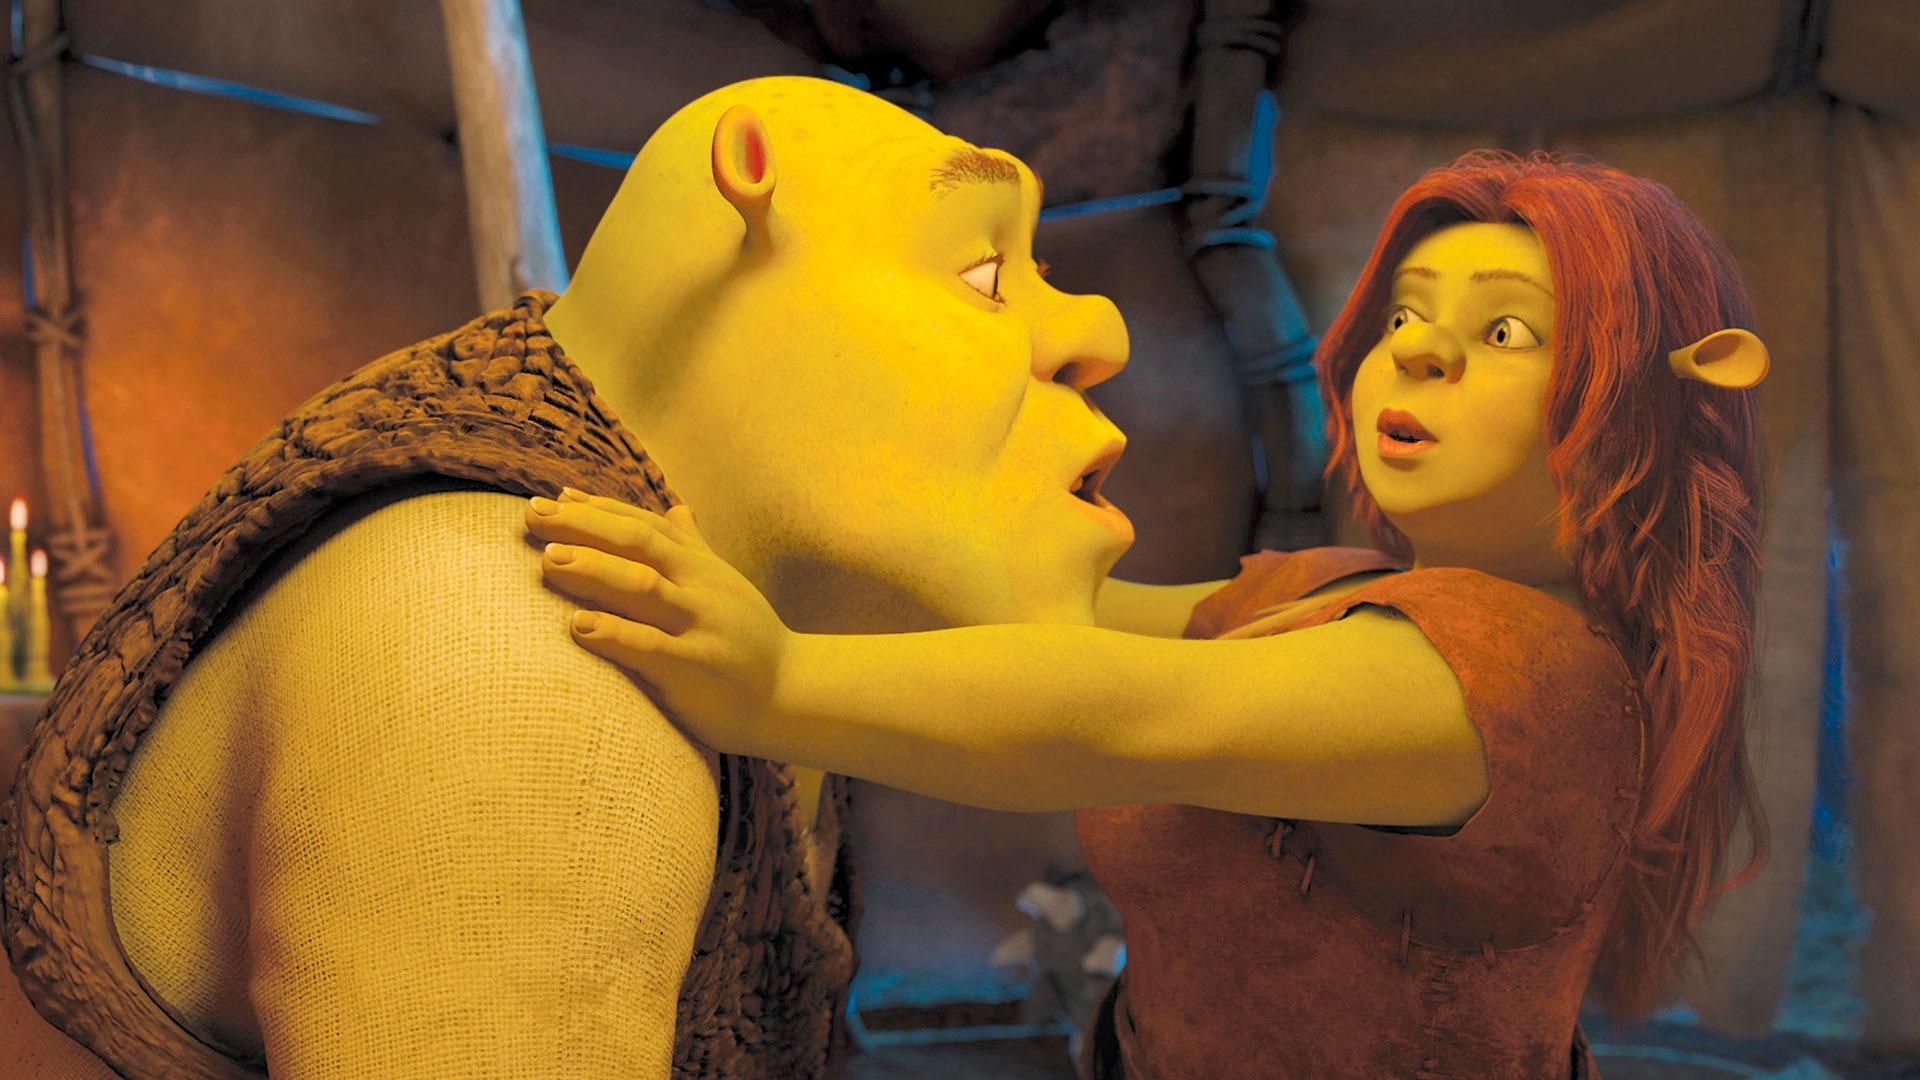 Shrek fionna pirn erotic film